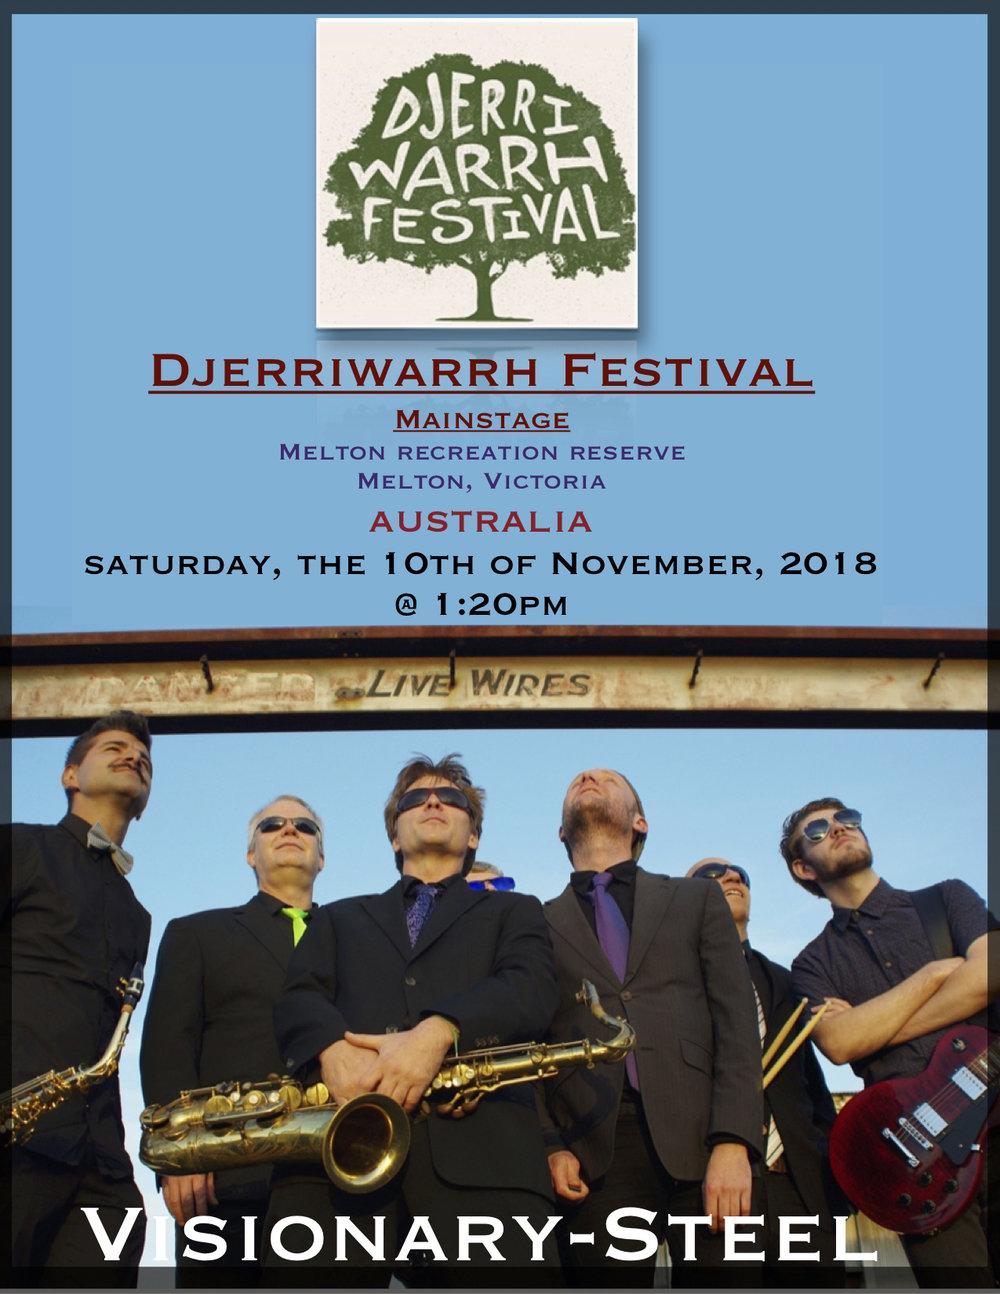 Visionary-Steel Promo Djerriwarrh Festival #2.jpg